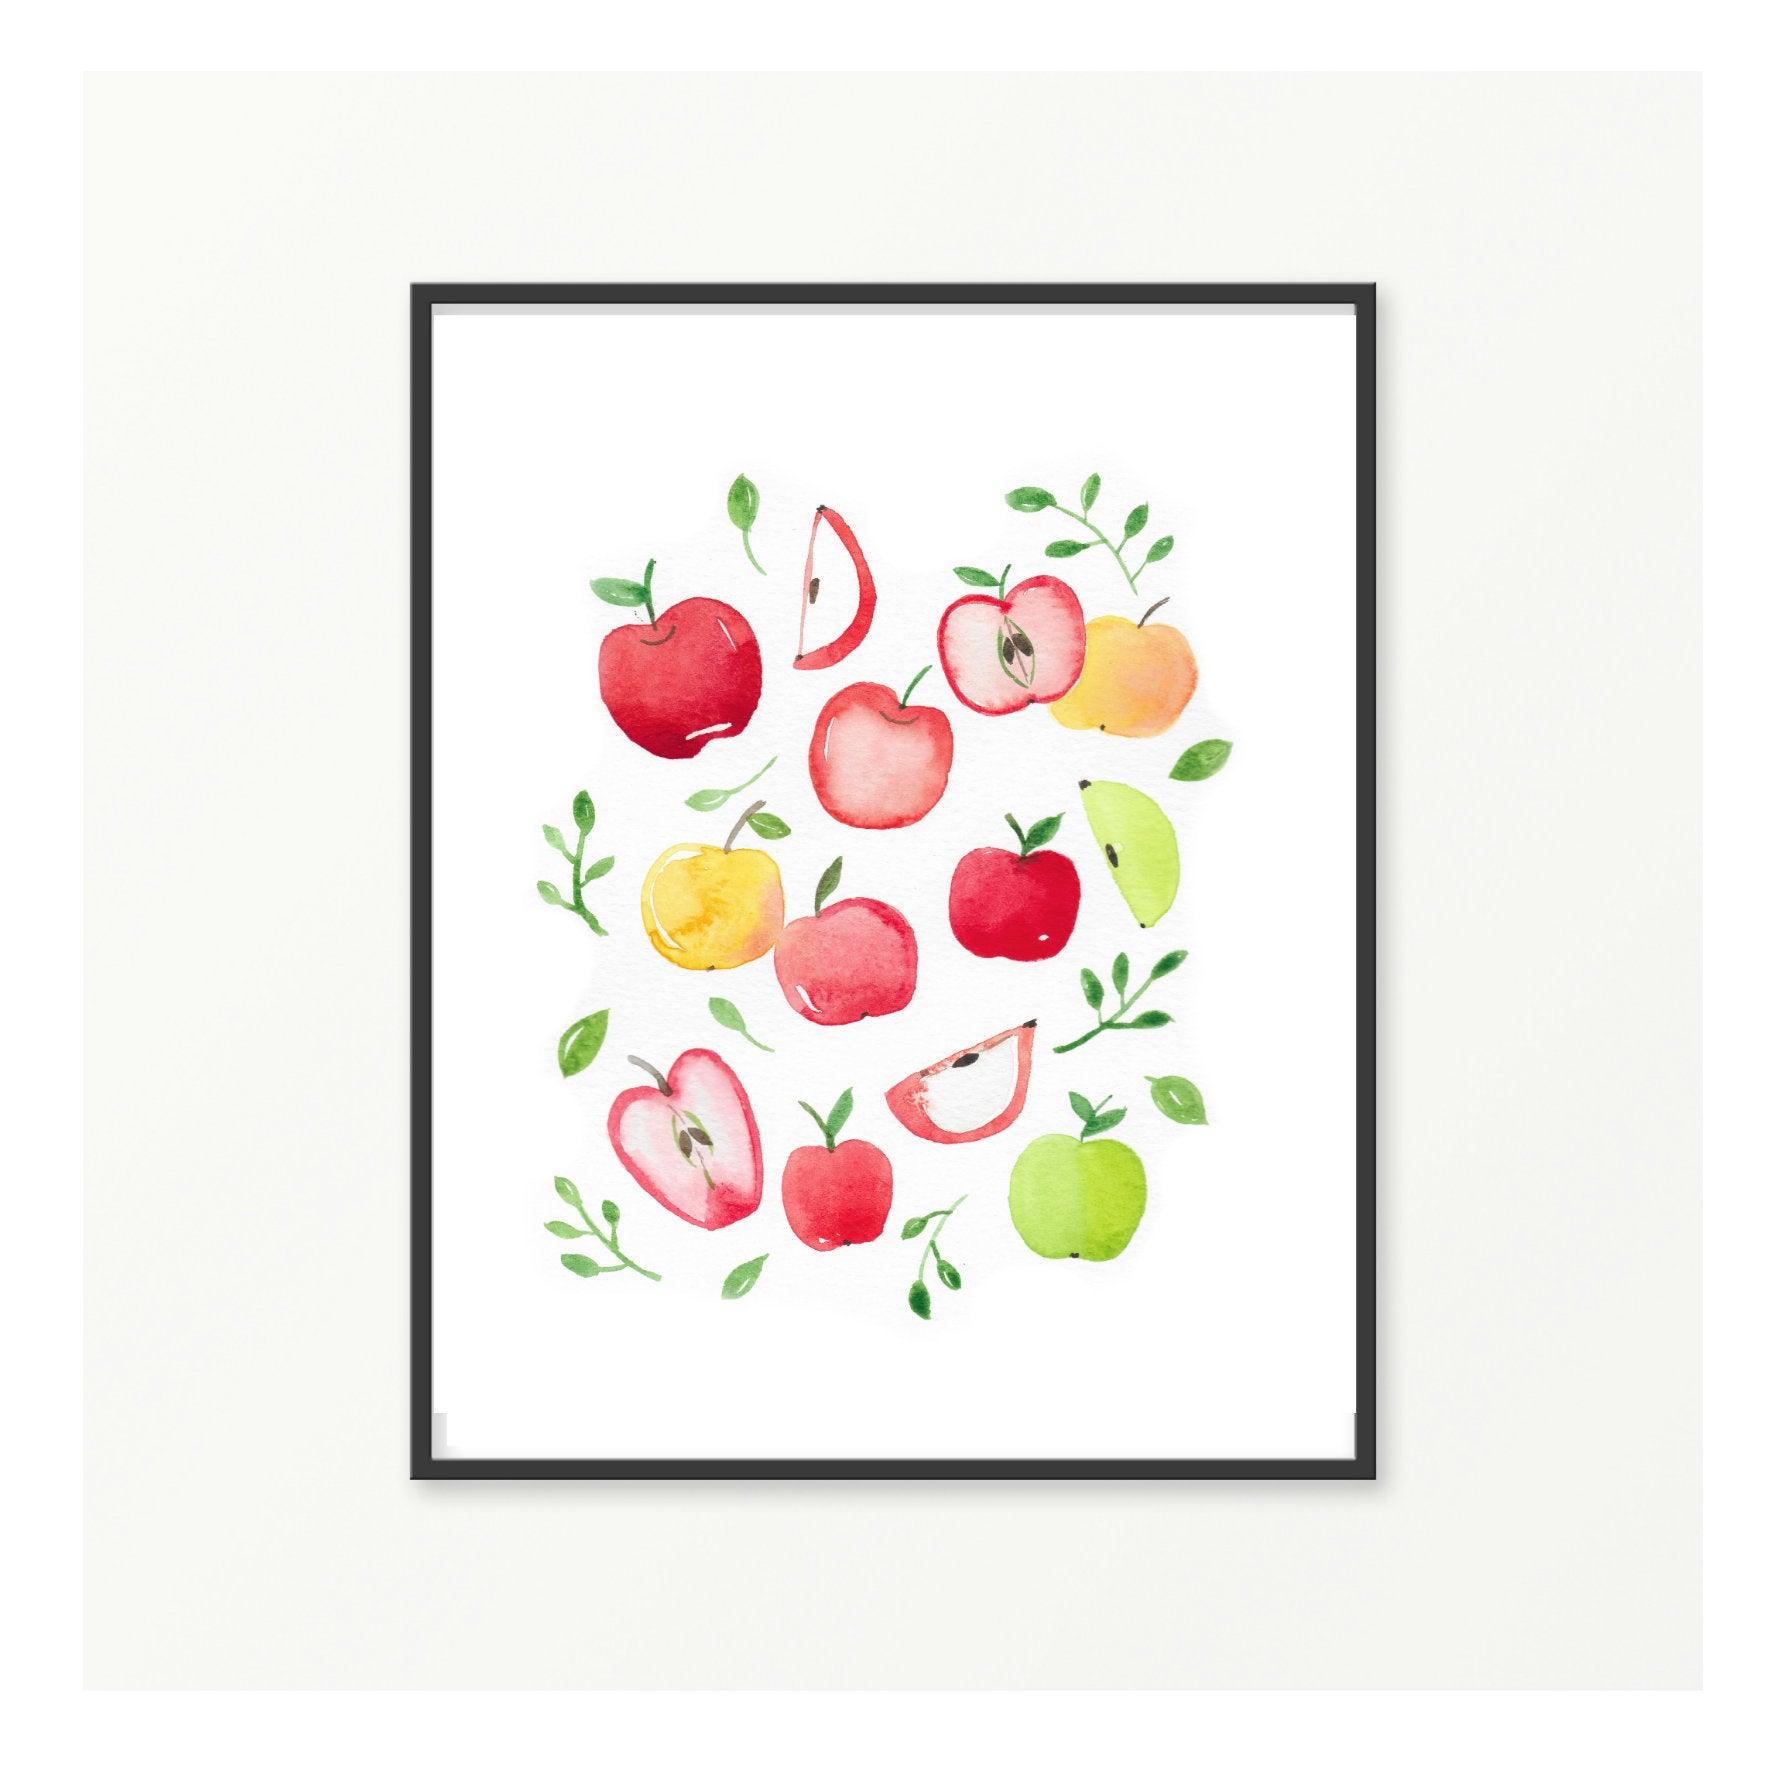 Impression, aquarelle minimaliste illustration de fruits